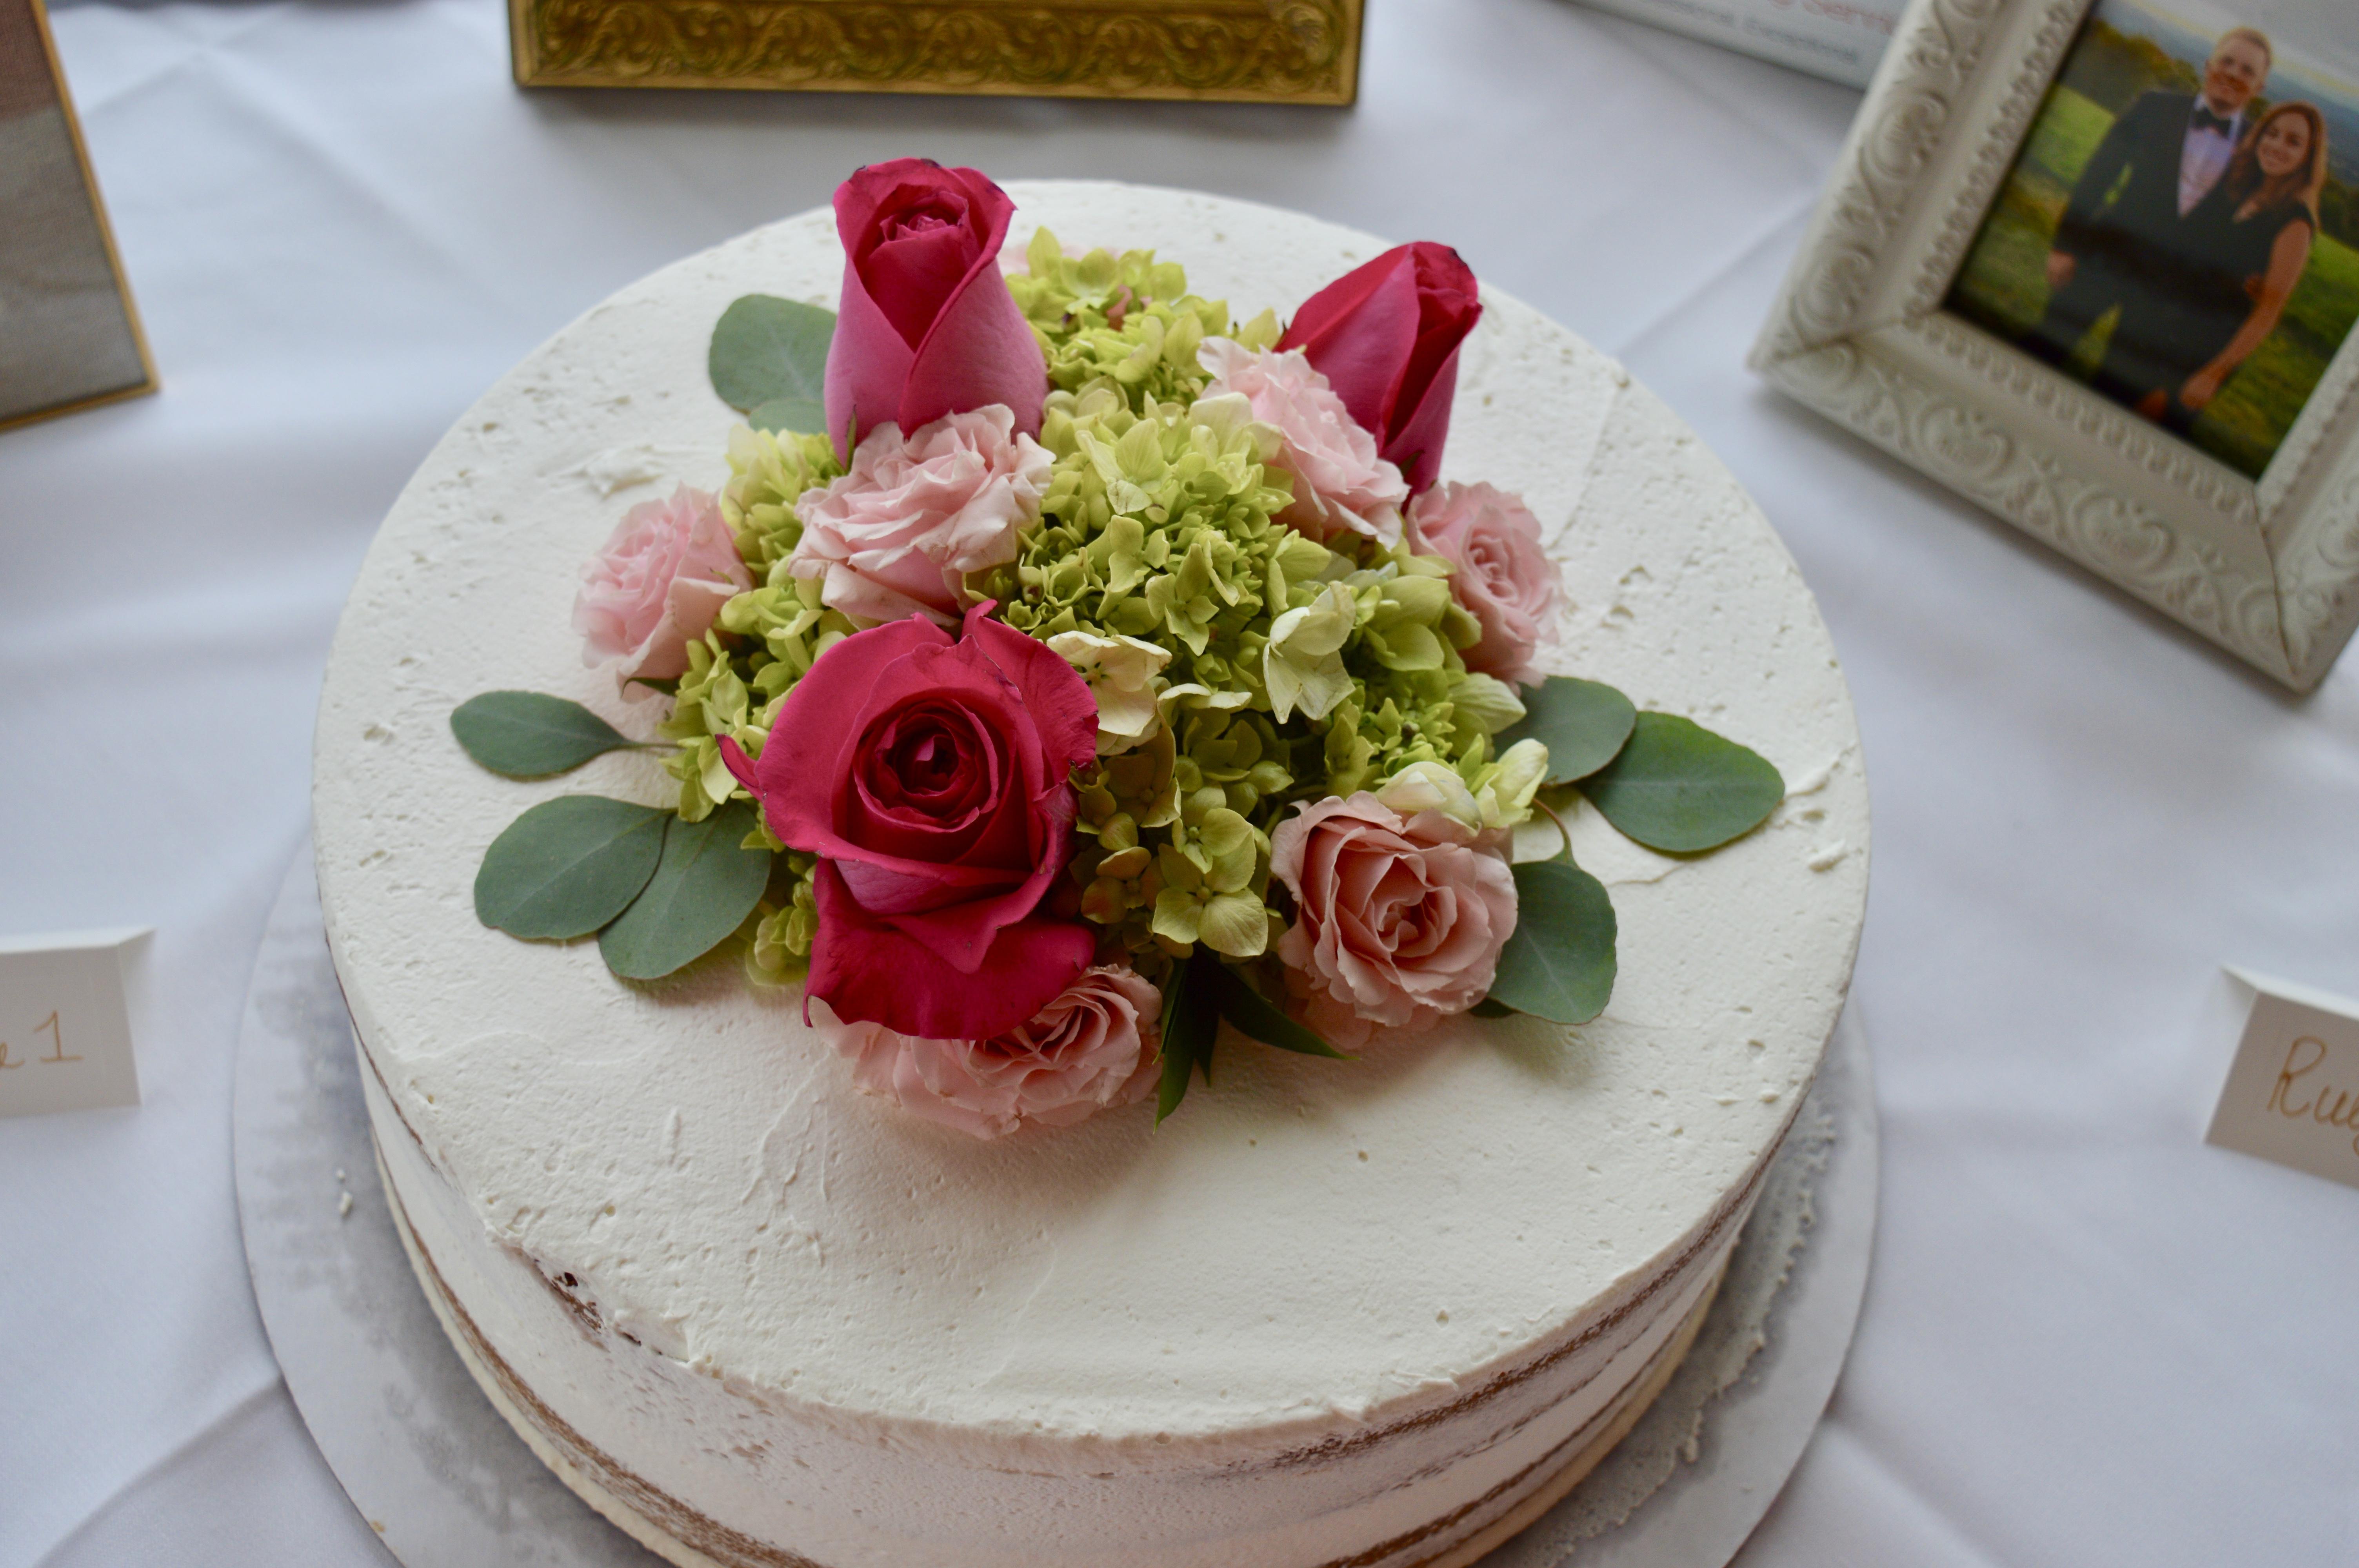 Gluten-free Vegan Bridal Shower Cake